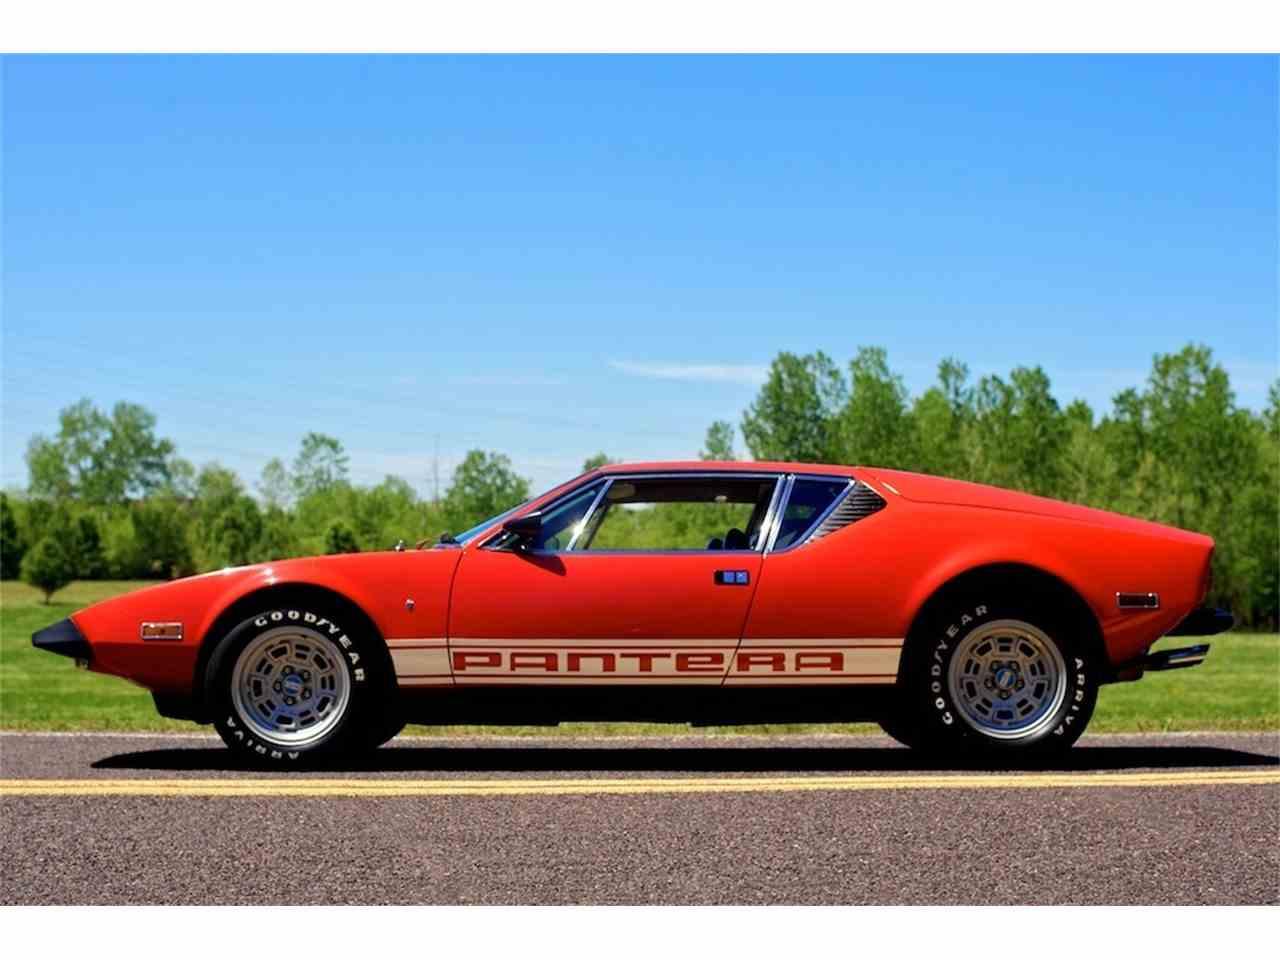 Classic detomaso Pantera for Sale on ClassicCarscom  5 Available